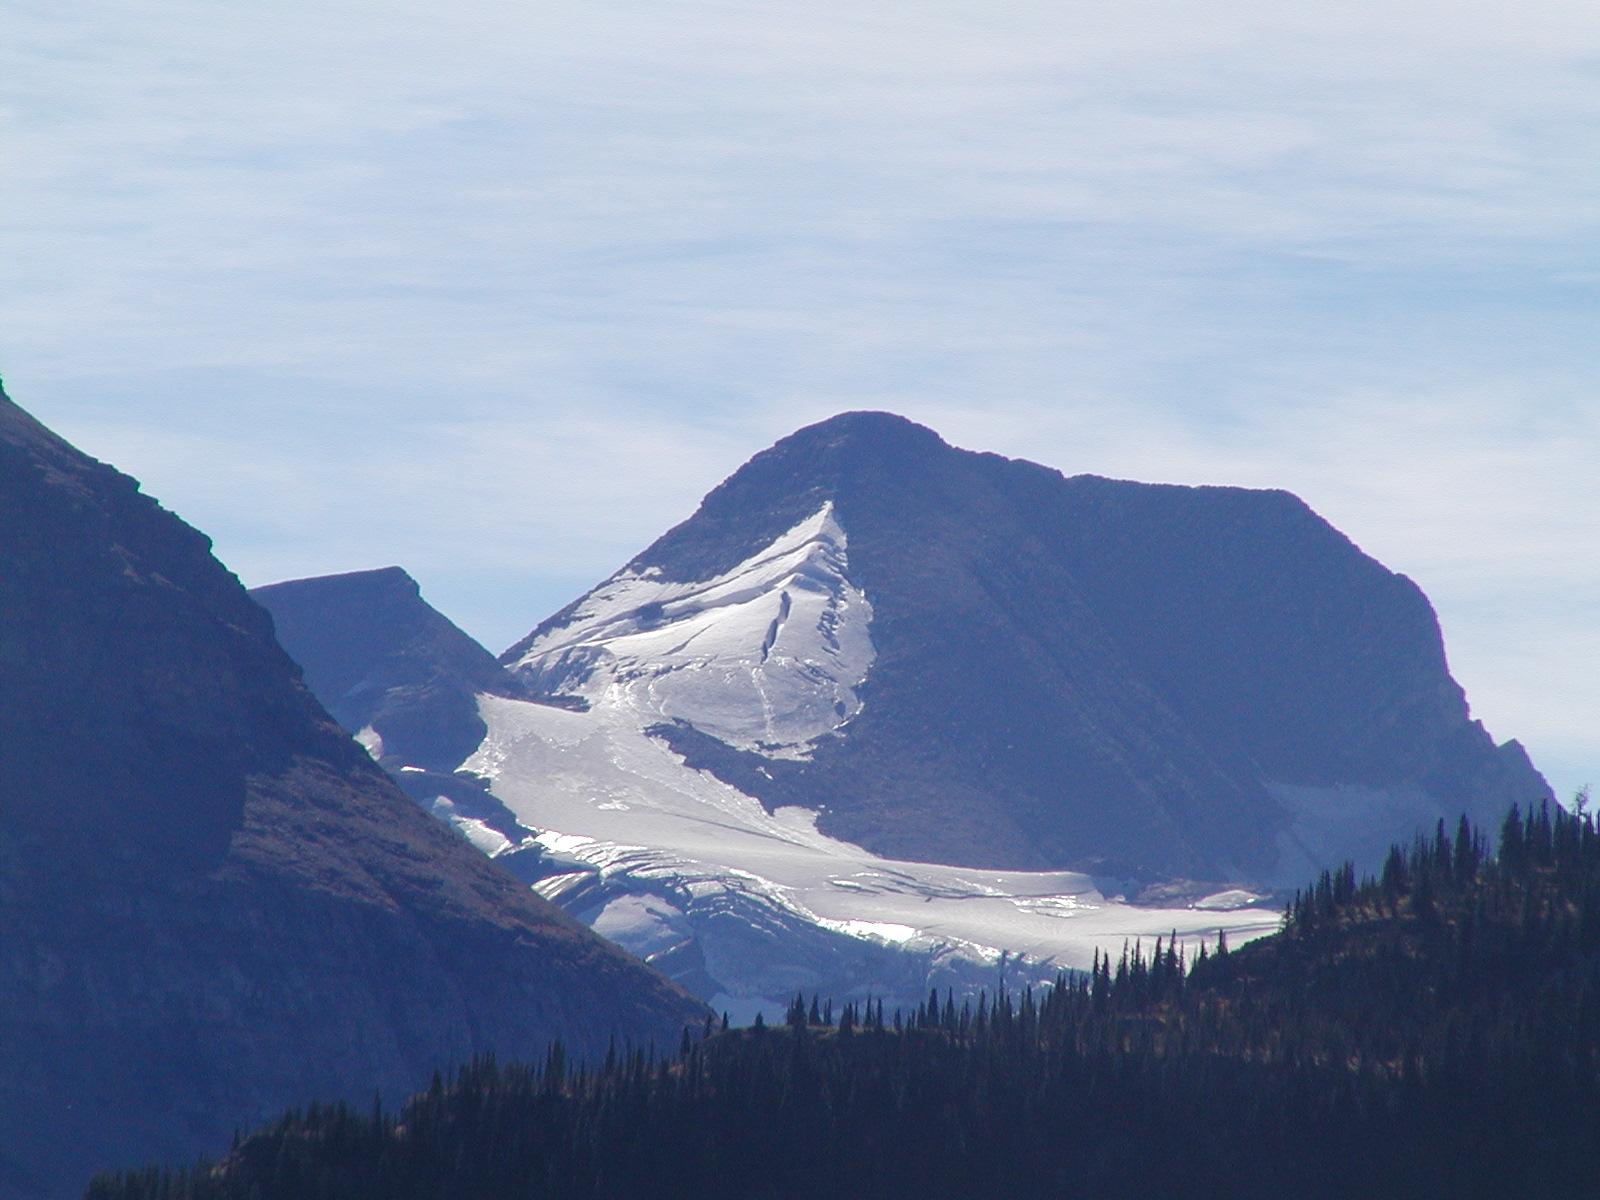 Chief Mountain, Photo by Cristina Eisenberg